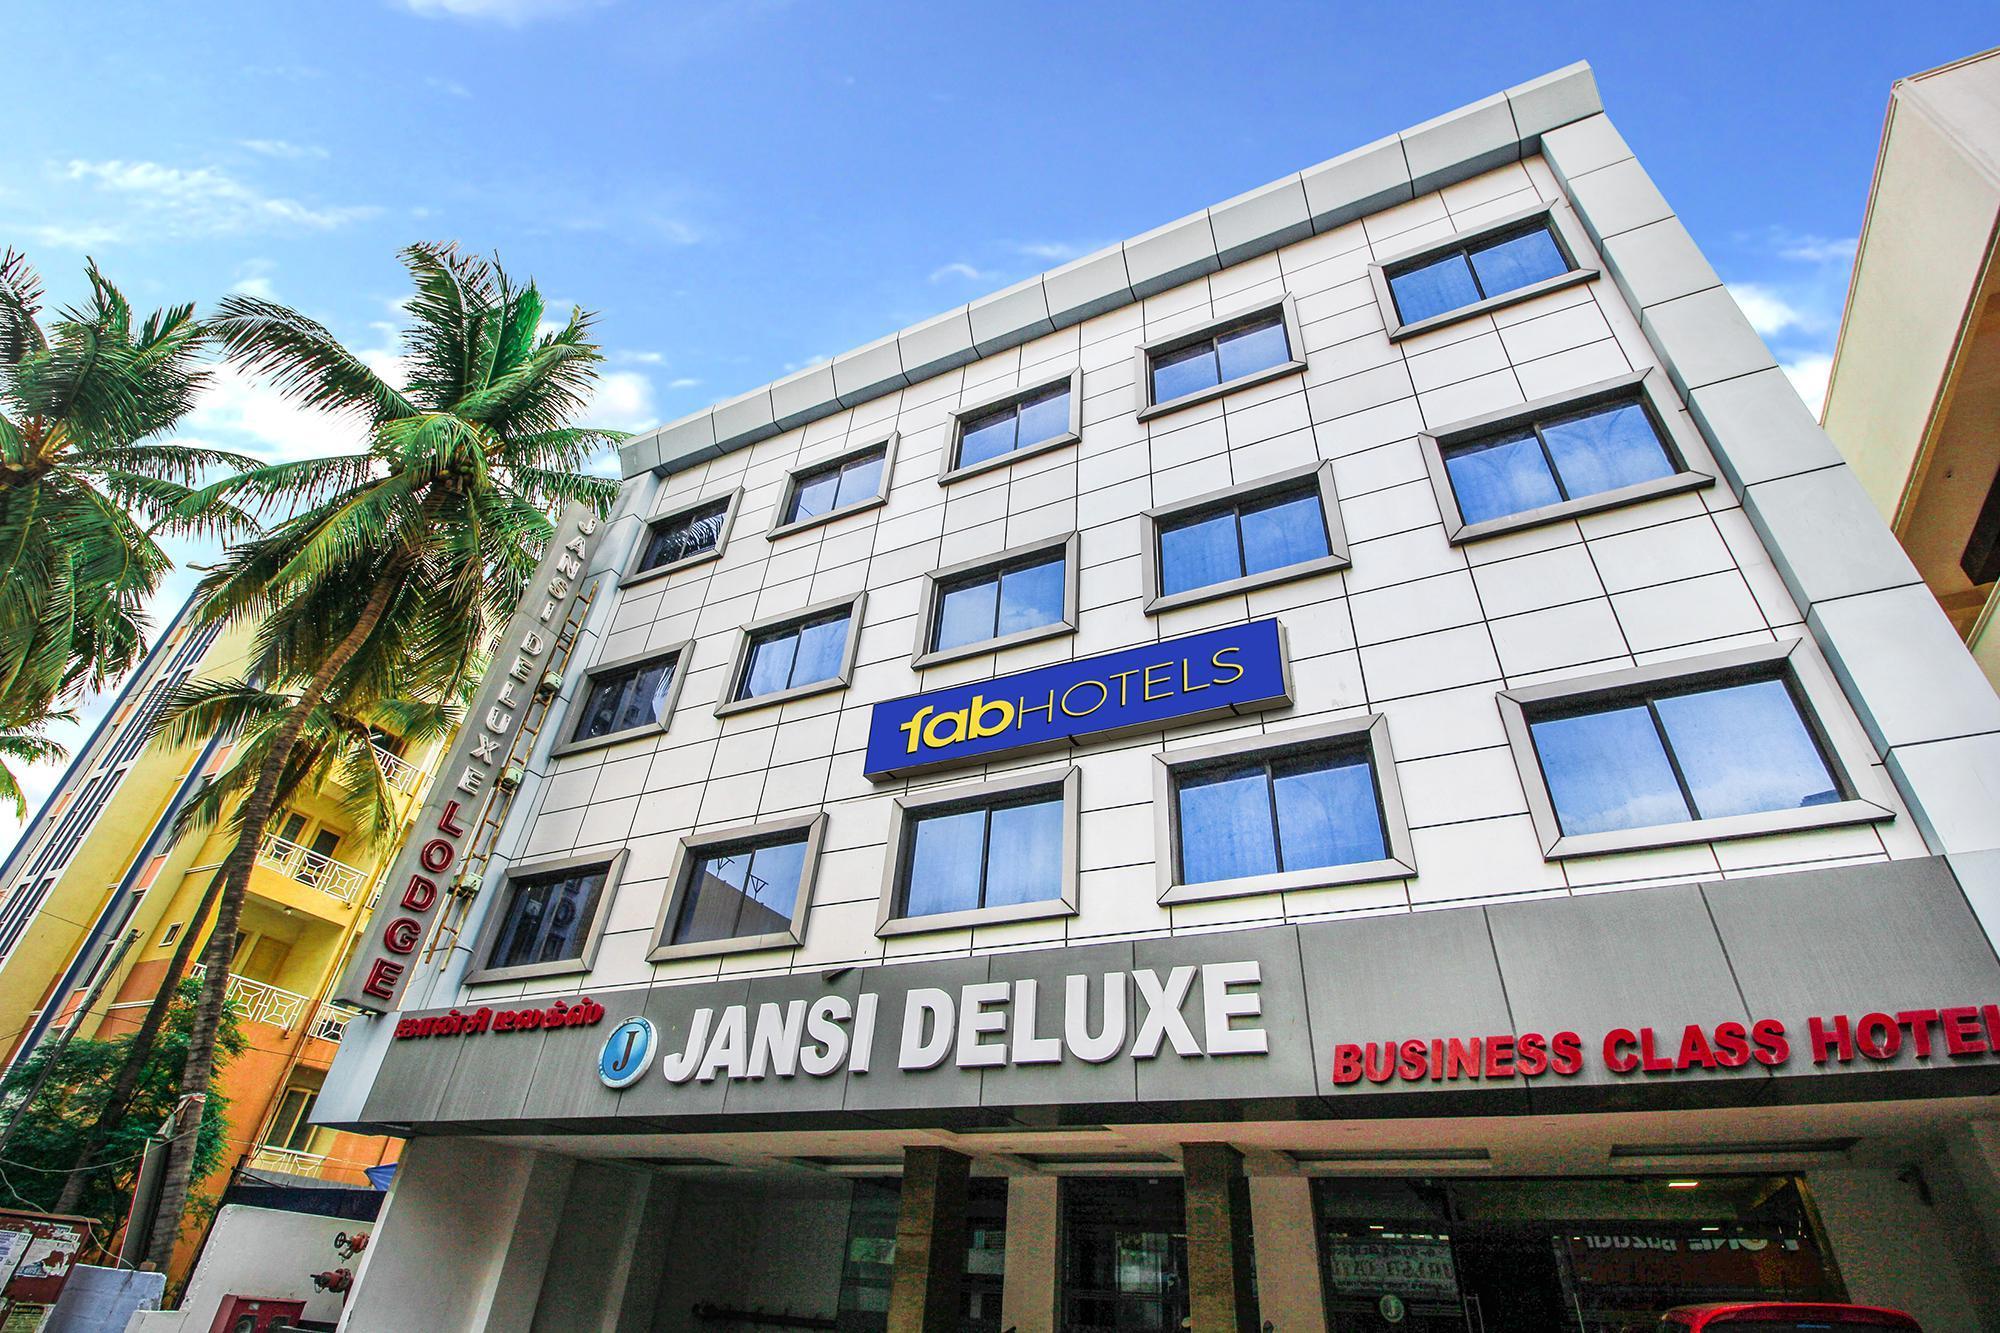 FabHotel Jansi Deluxe